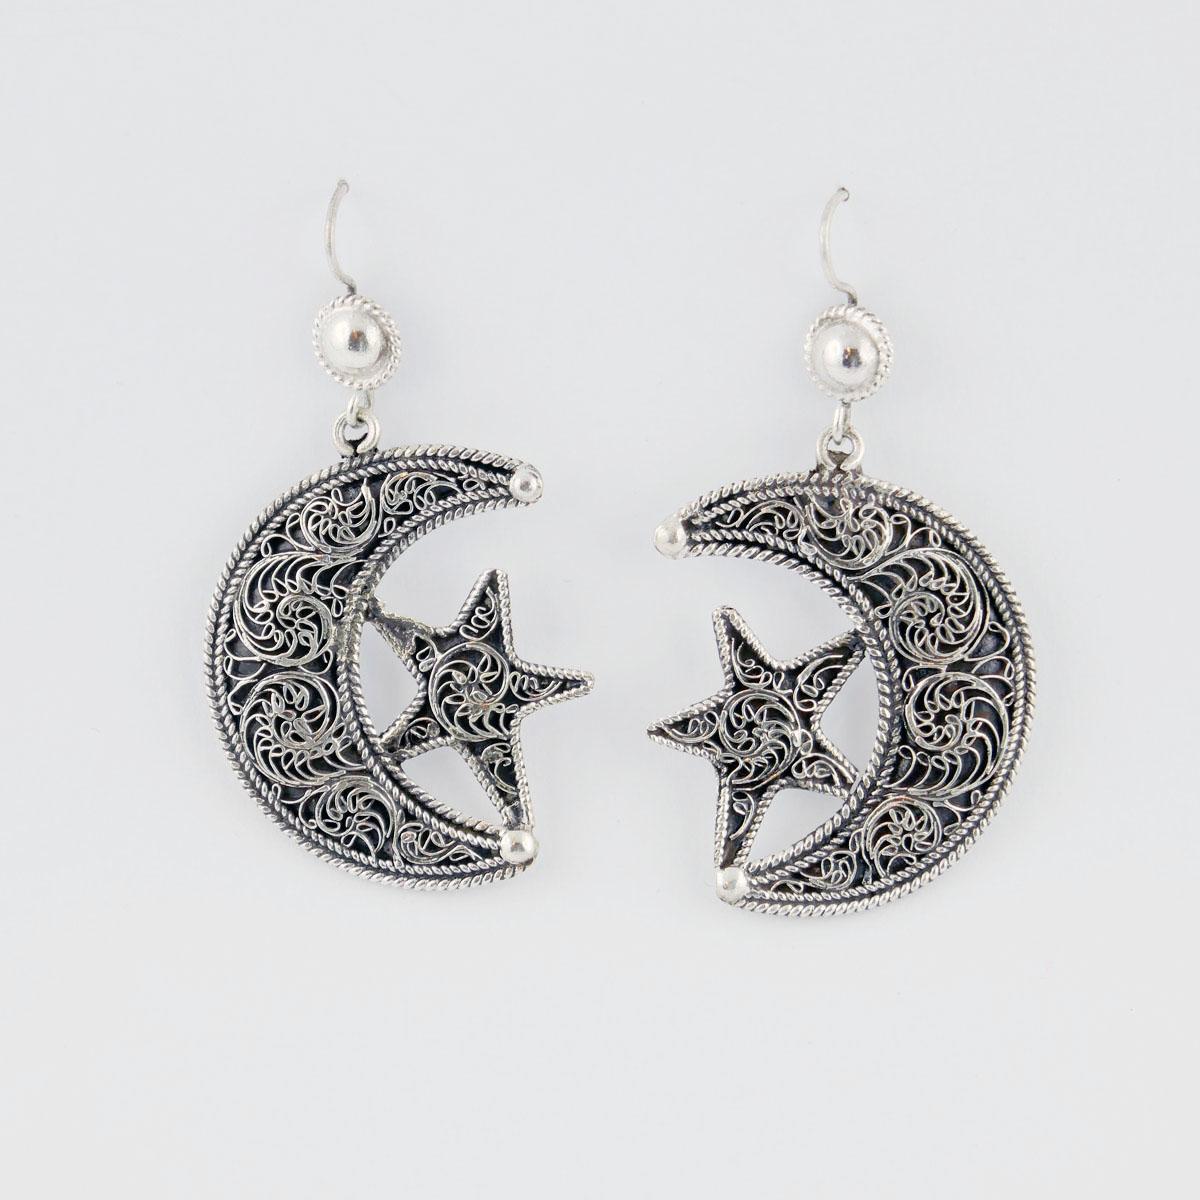 Earrings moon star with fine filigree work, silver